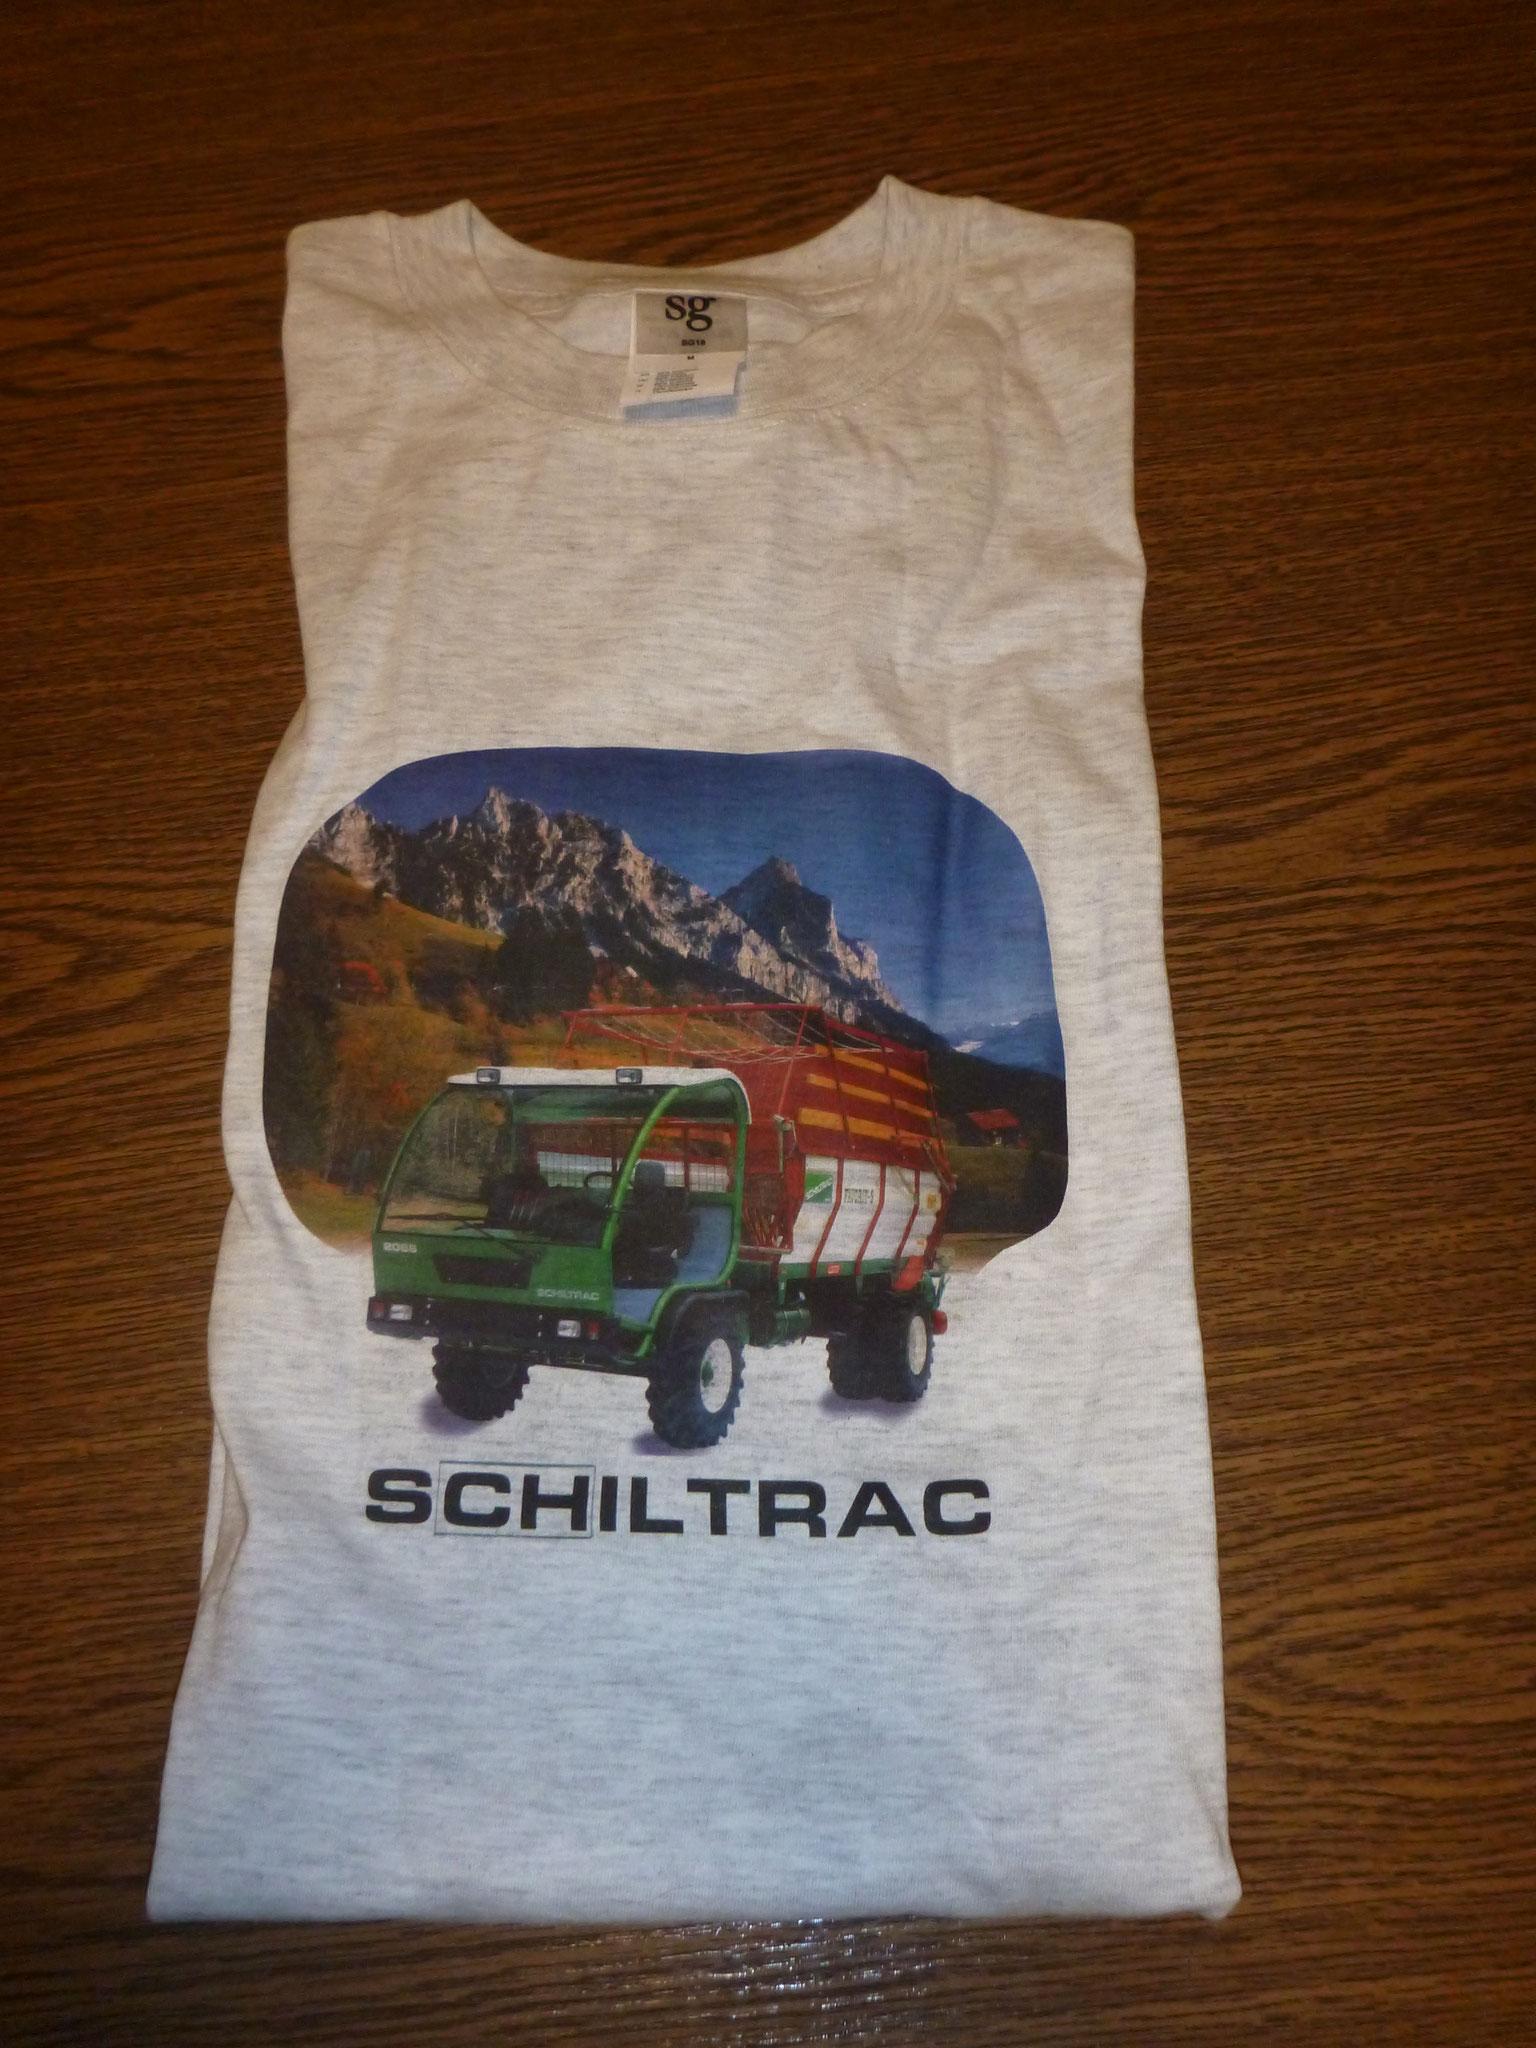 Schiltractshirt